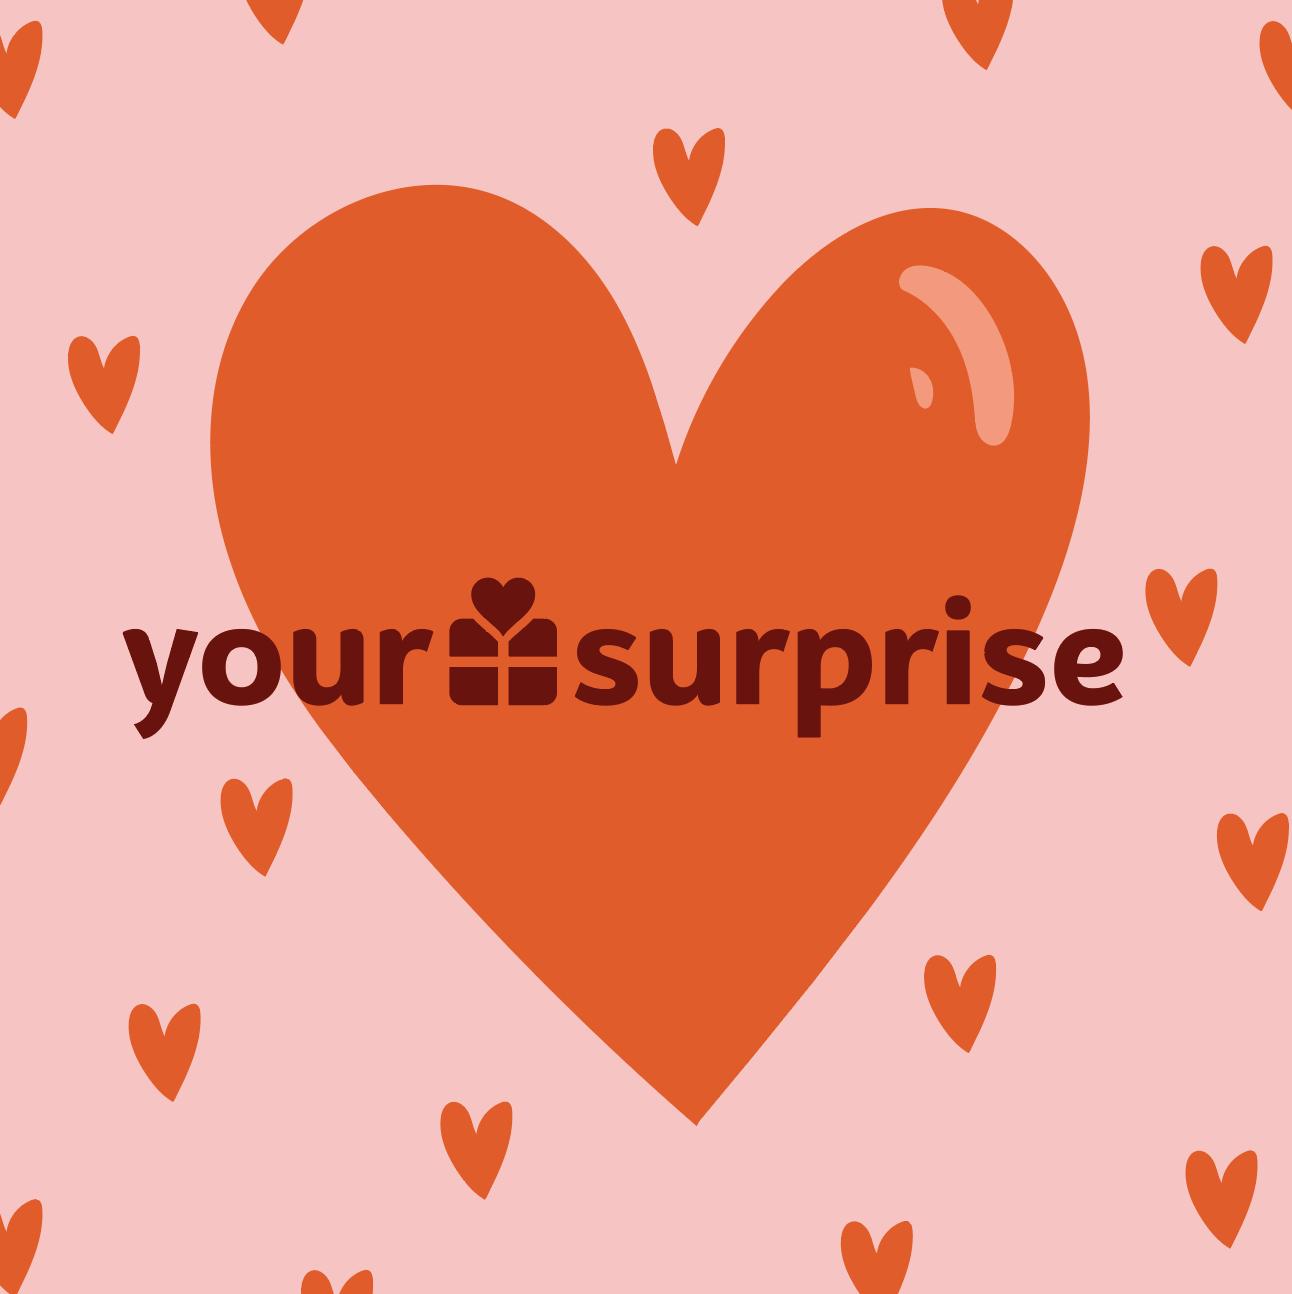 YourSurprise